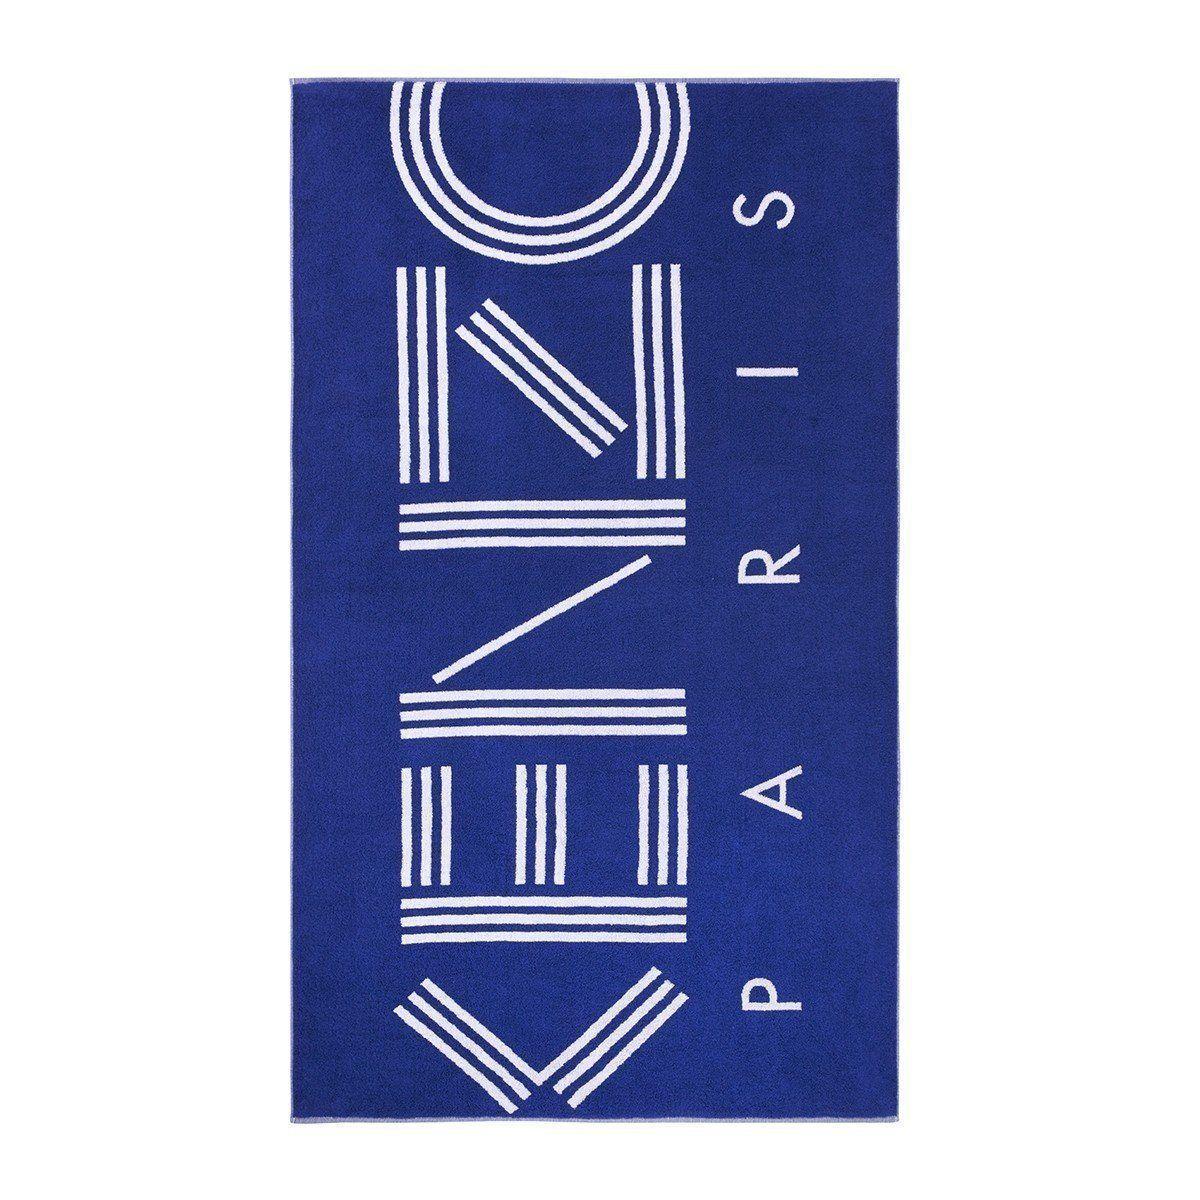 Sport Beach Towel by Kenzo   sport towel display #instagood #photo #figlinenswestport #picoftheday #Figlinensandhome #interiors #homedecor #luxurylinens #boutiqueshopping #boutique